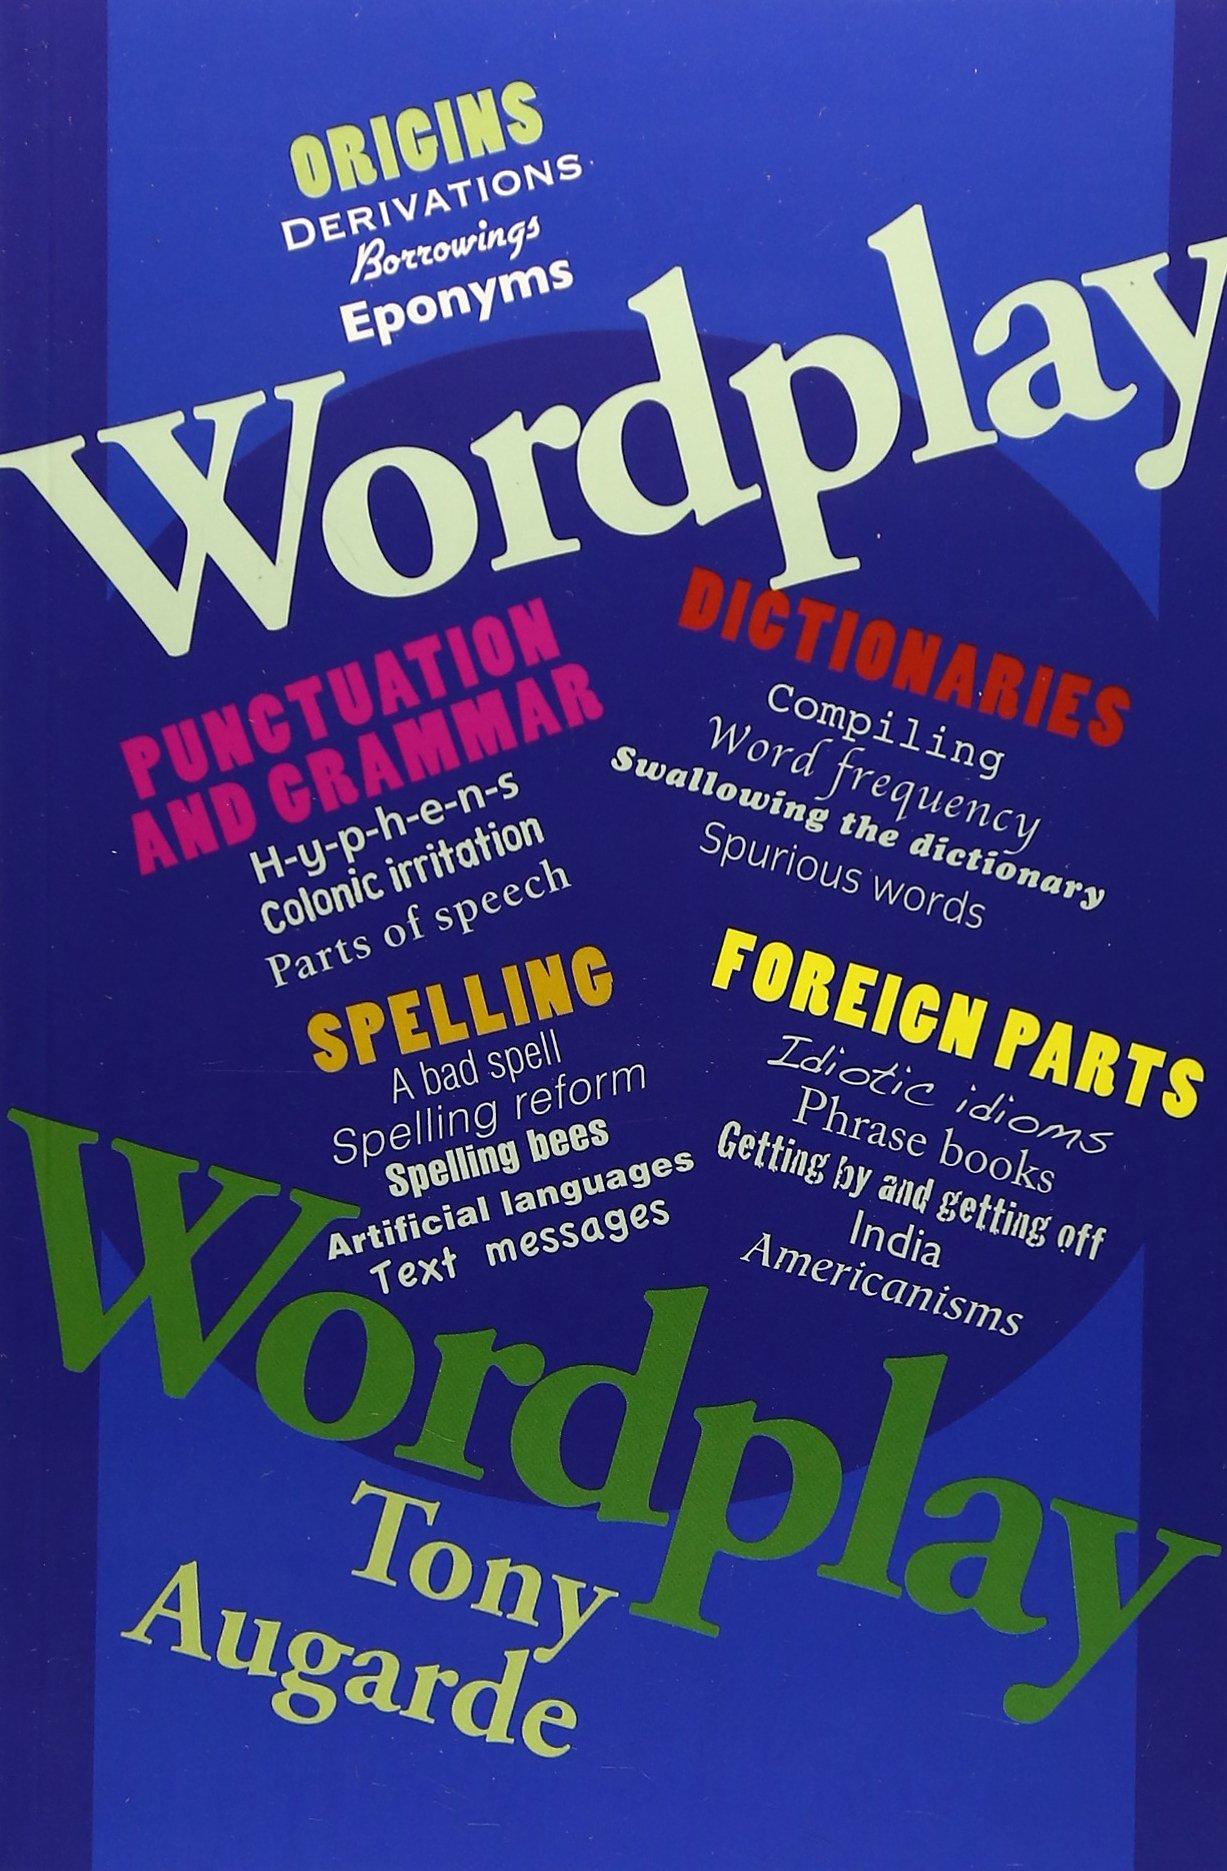 Wordplay: The Wonderful World of Words ebook